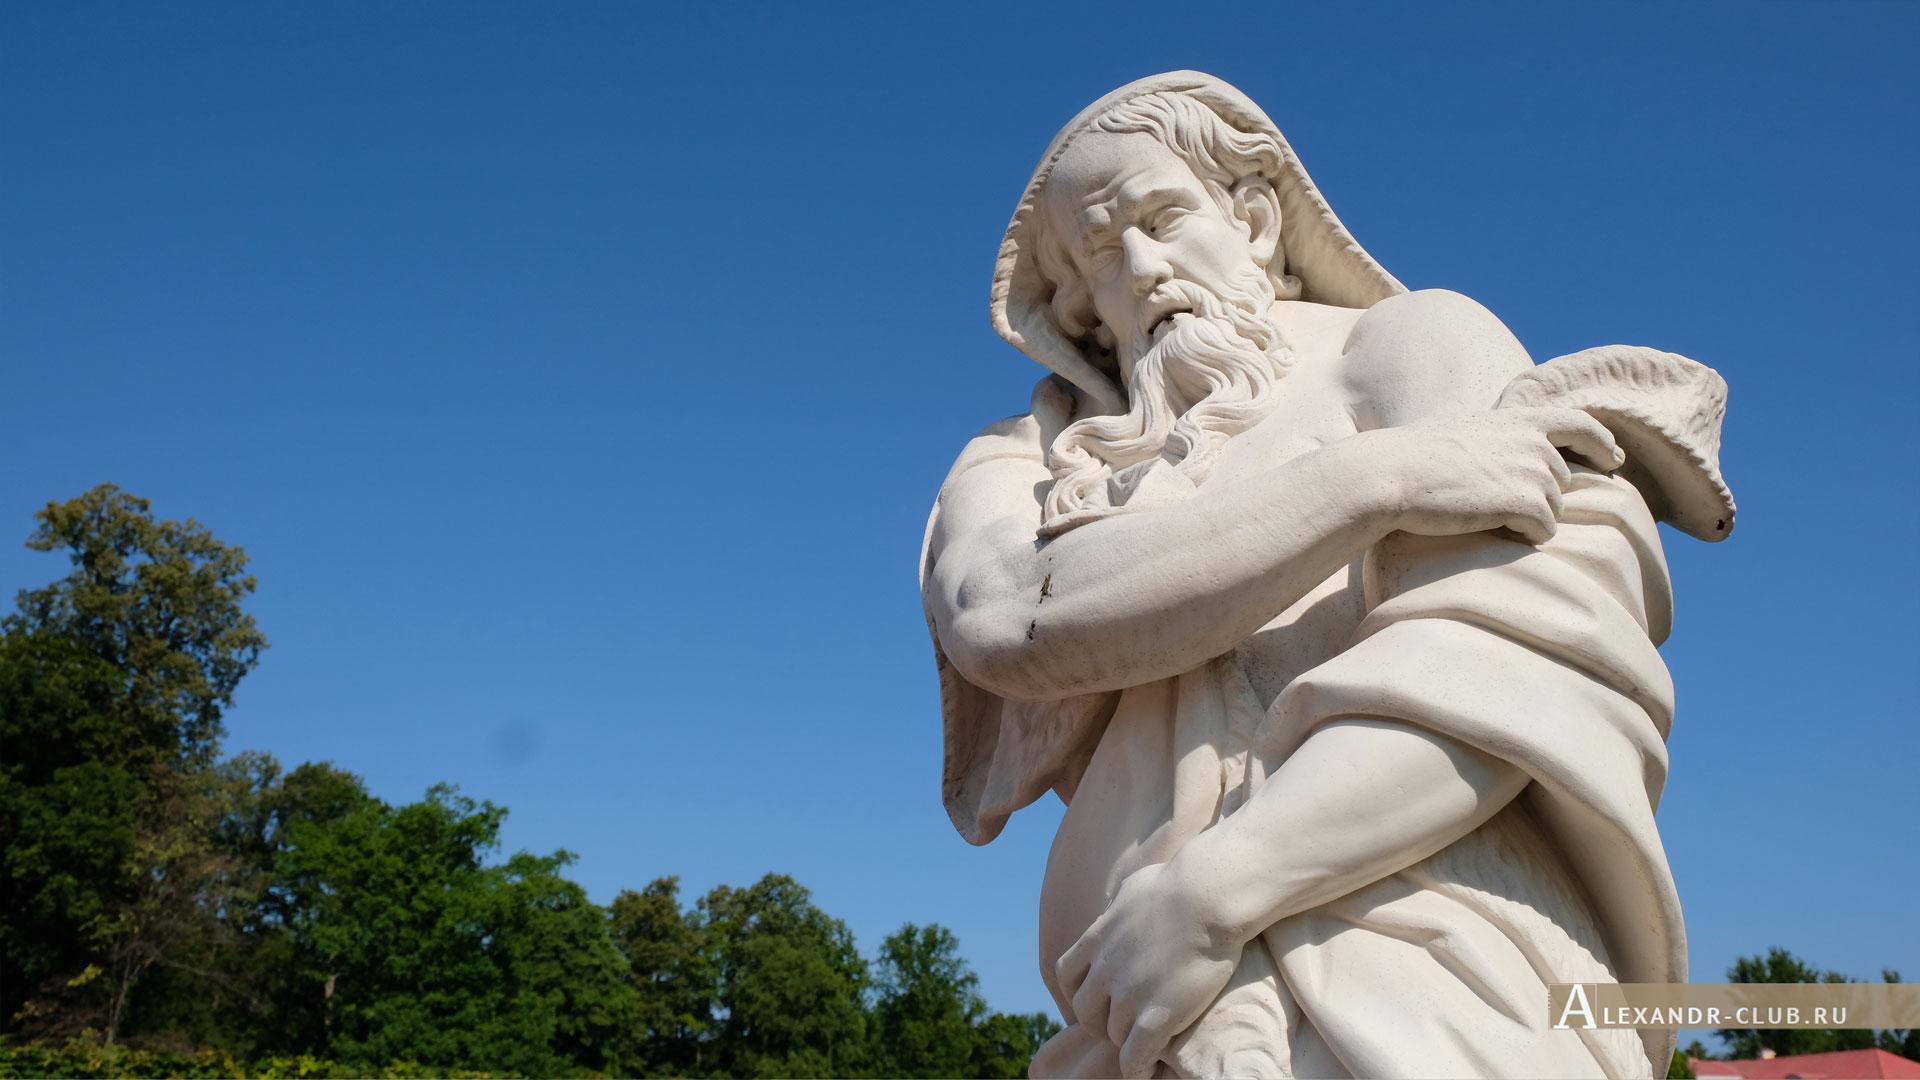 Ораниенбаум, лето, Нижний сад, скульптура